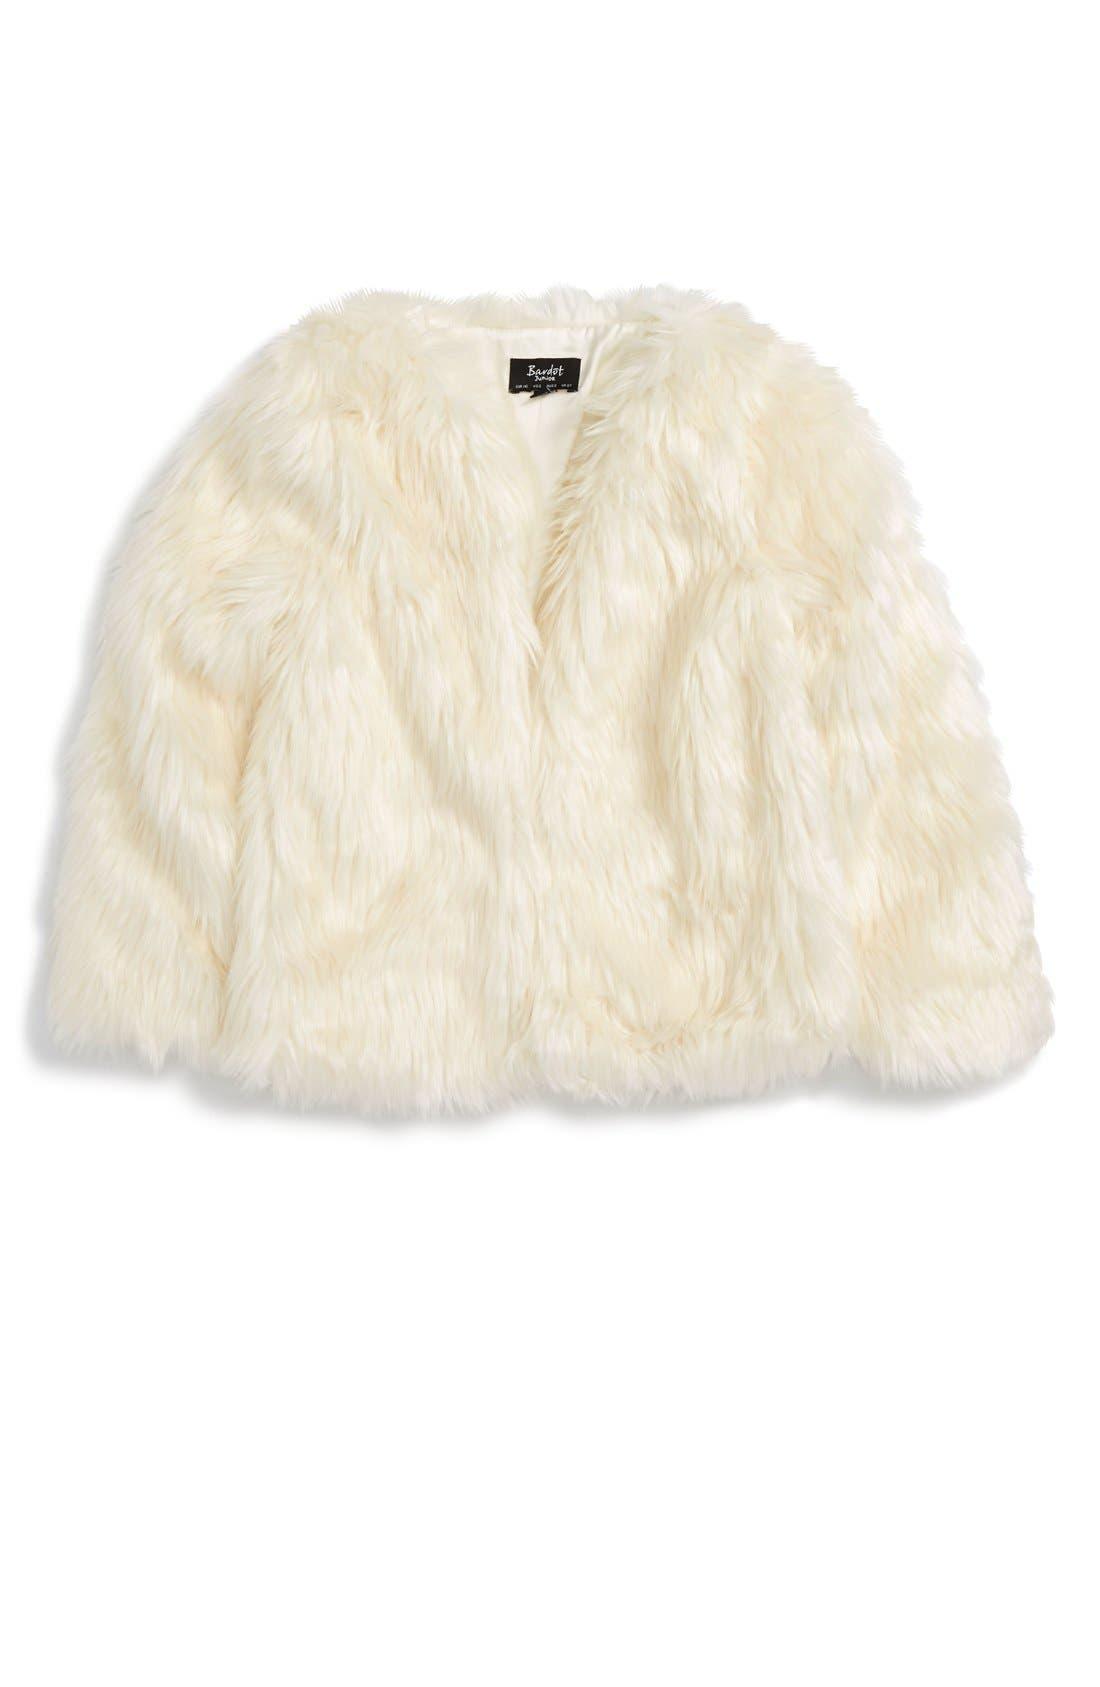 BARDOT JUNIOR, Faux Fur Jacket, Main thumbnail 1, color, 102